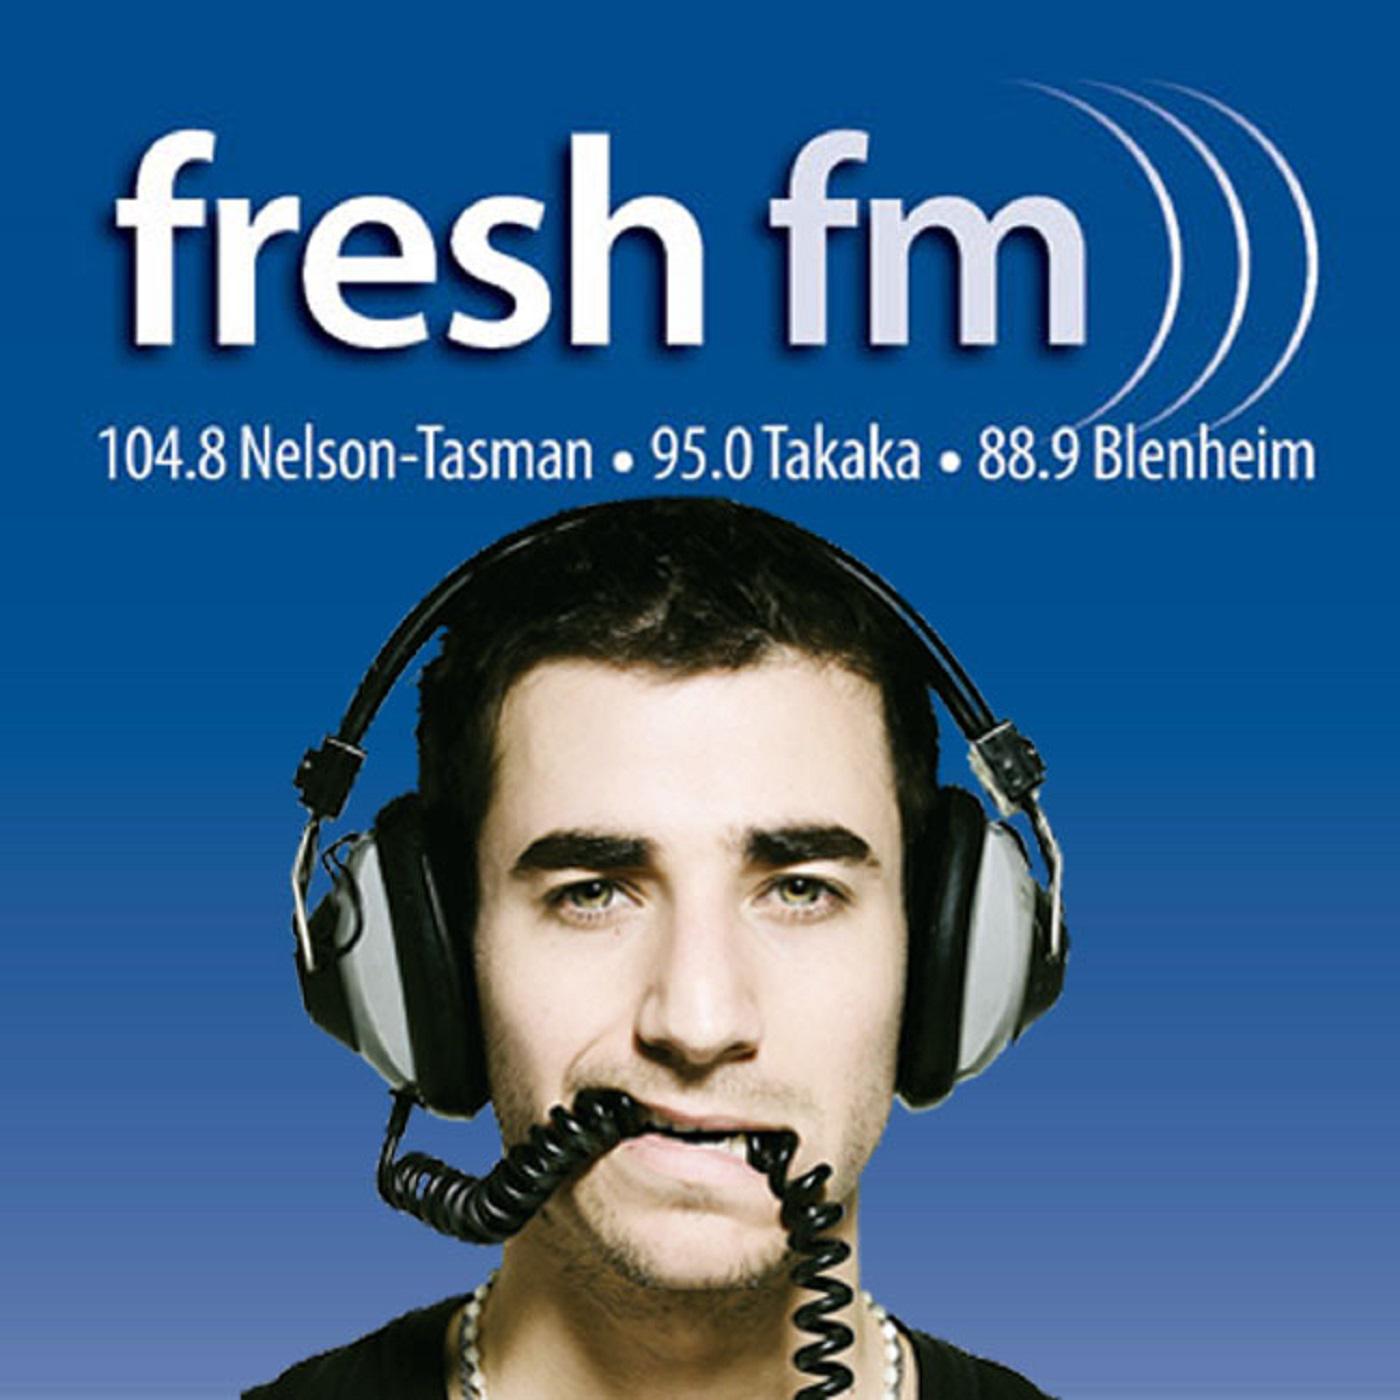 https://static.accessradio.org/StationFolder/freshfm/Images/Fresh-FM-Art140069.png